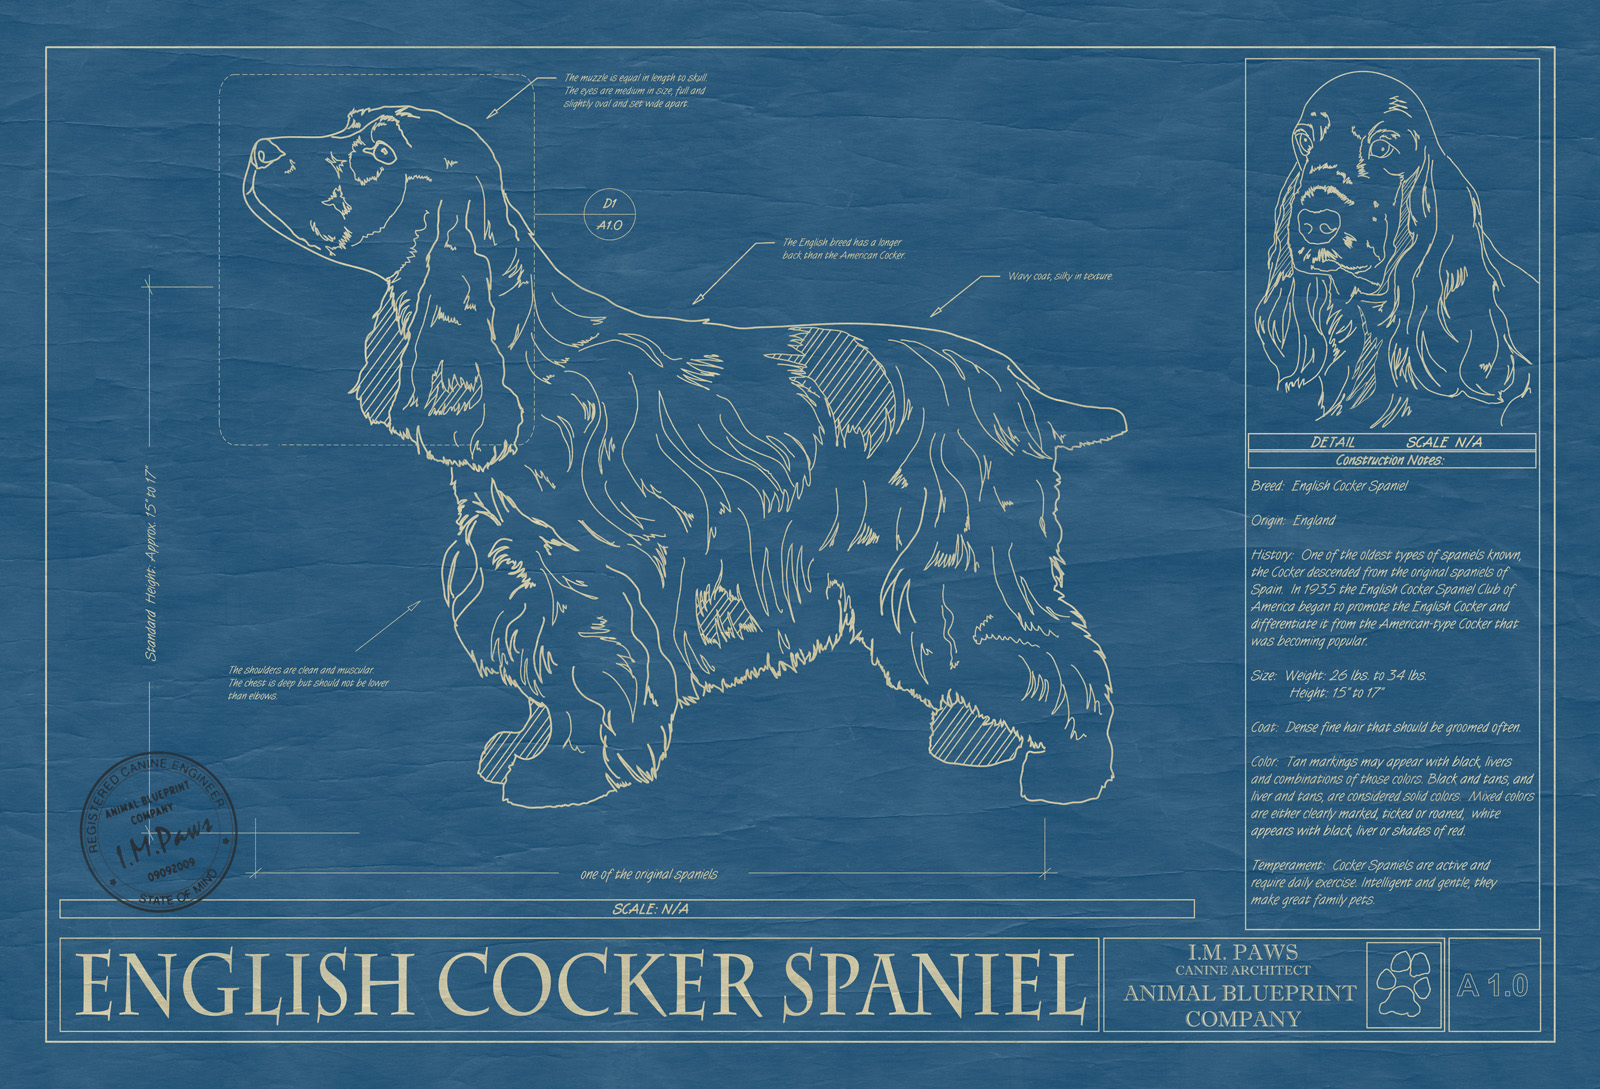 Cocker spaniel english animal blueprint company english cocker spaniel dog blueprint malvernweather Images